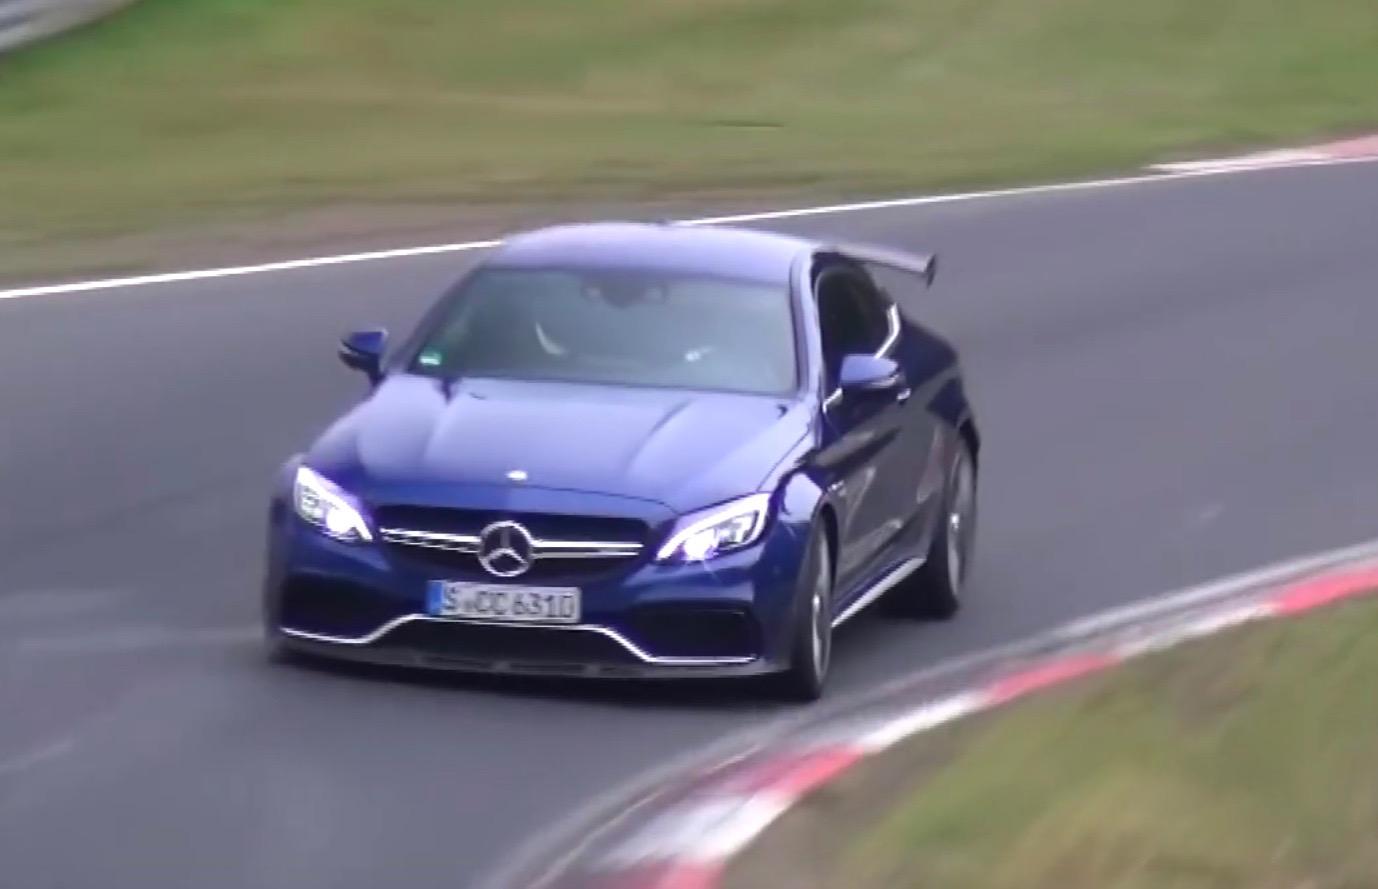 Mercedes-AMG C63 R: Could It Shame 493hp BMW M4 GTS?